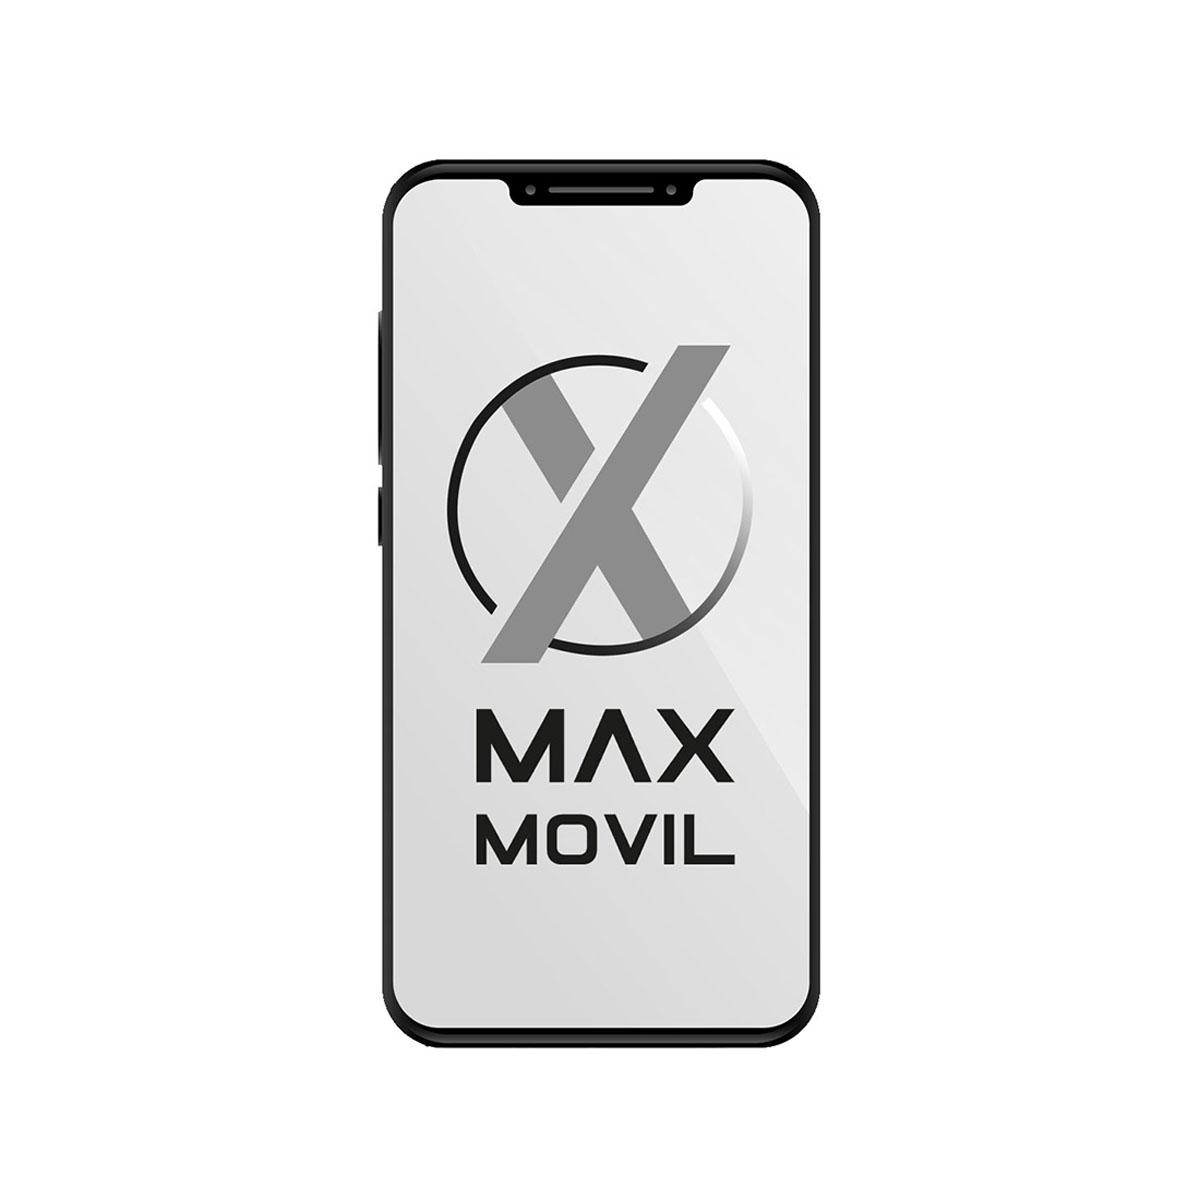 Apple iPhone SE (2020) 128GB (PRODUCT) Rojo MX9U2QL/A